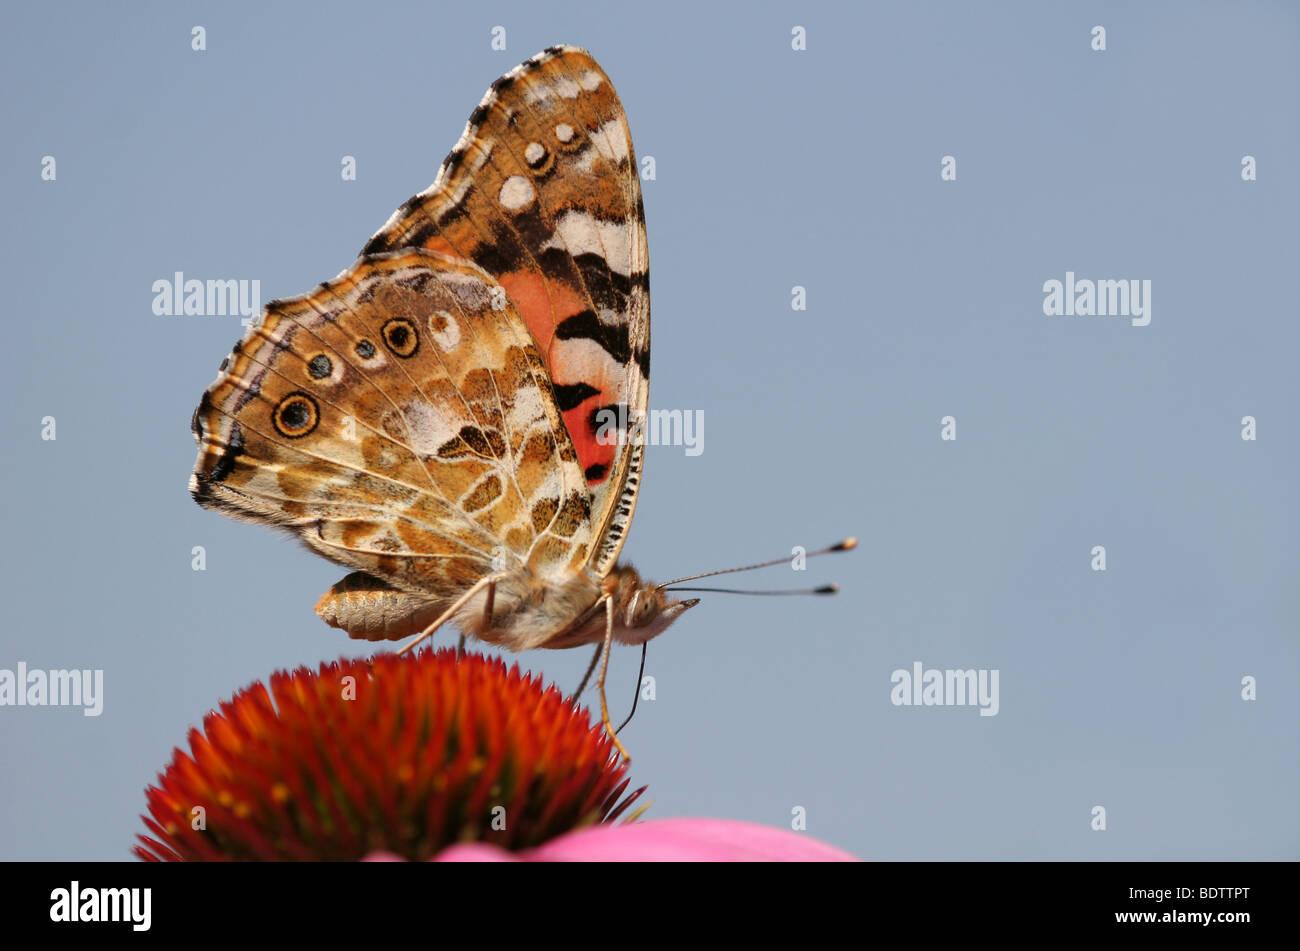 Distelfalter, Vanessa cardui, painted Lady, Sonnenhut, Echinacea - Stock Image